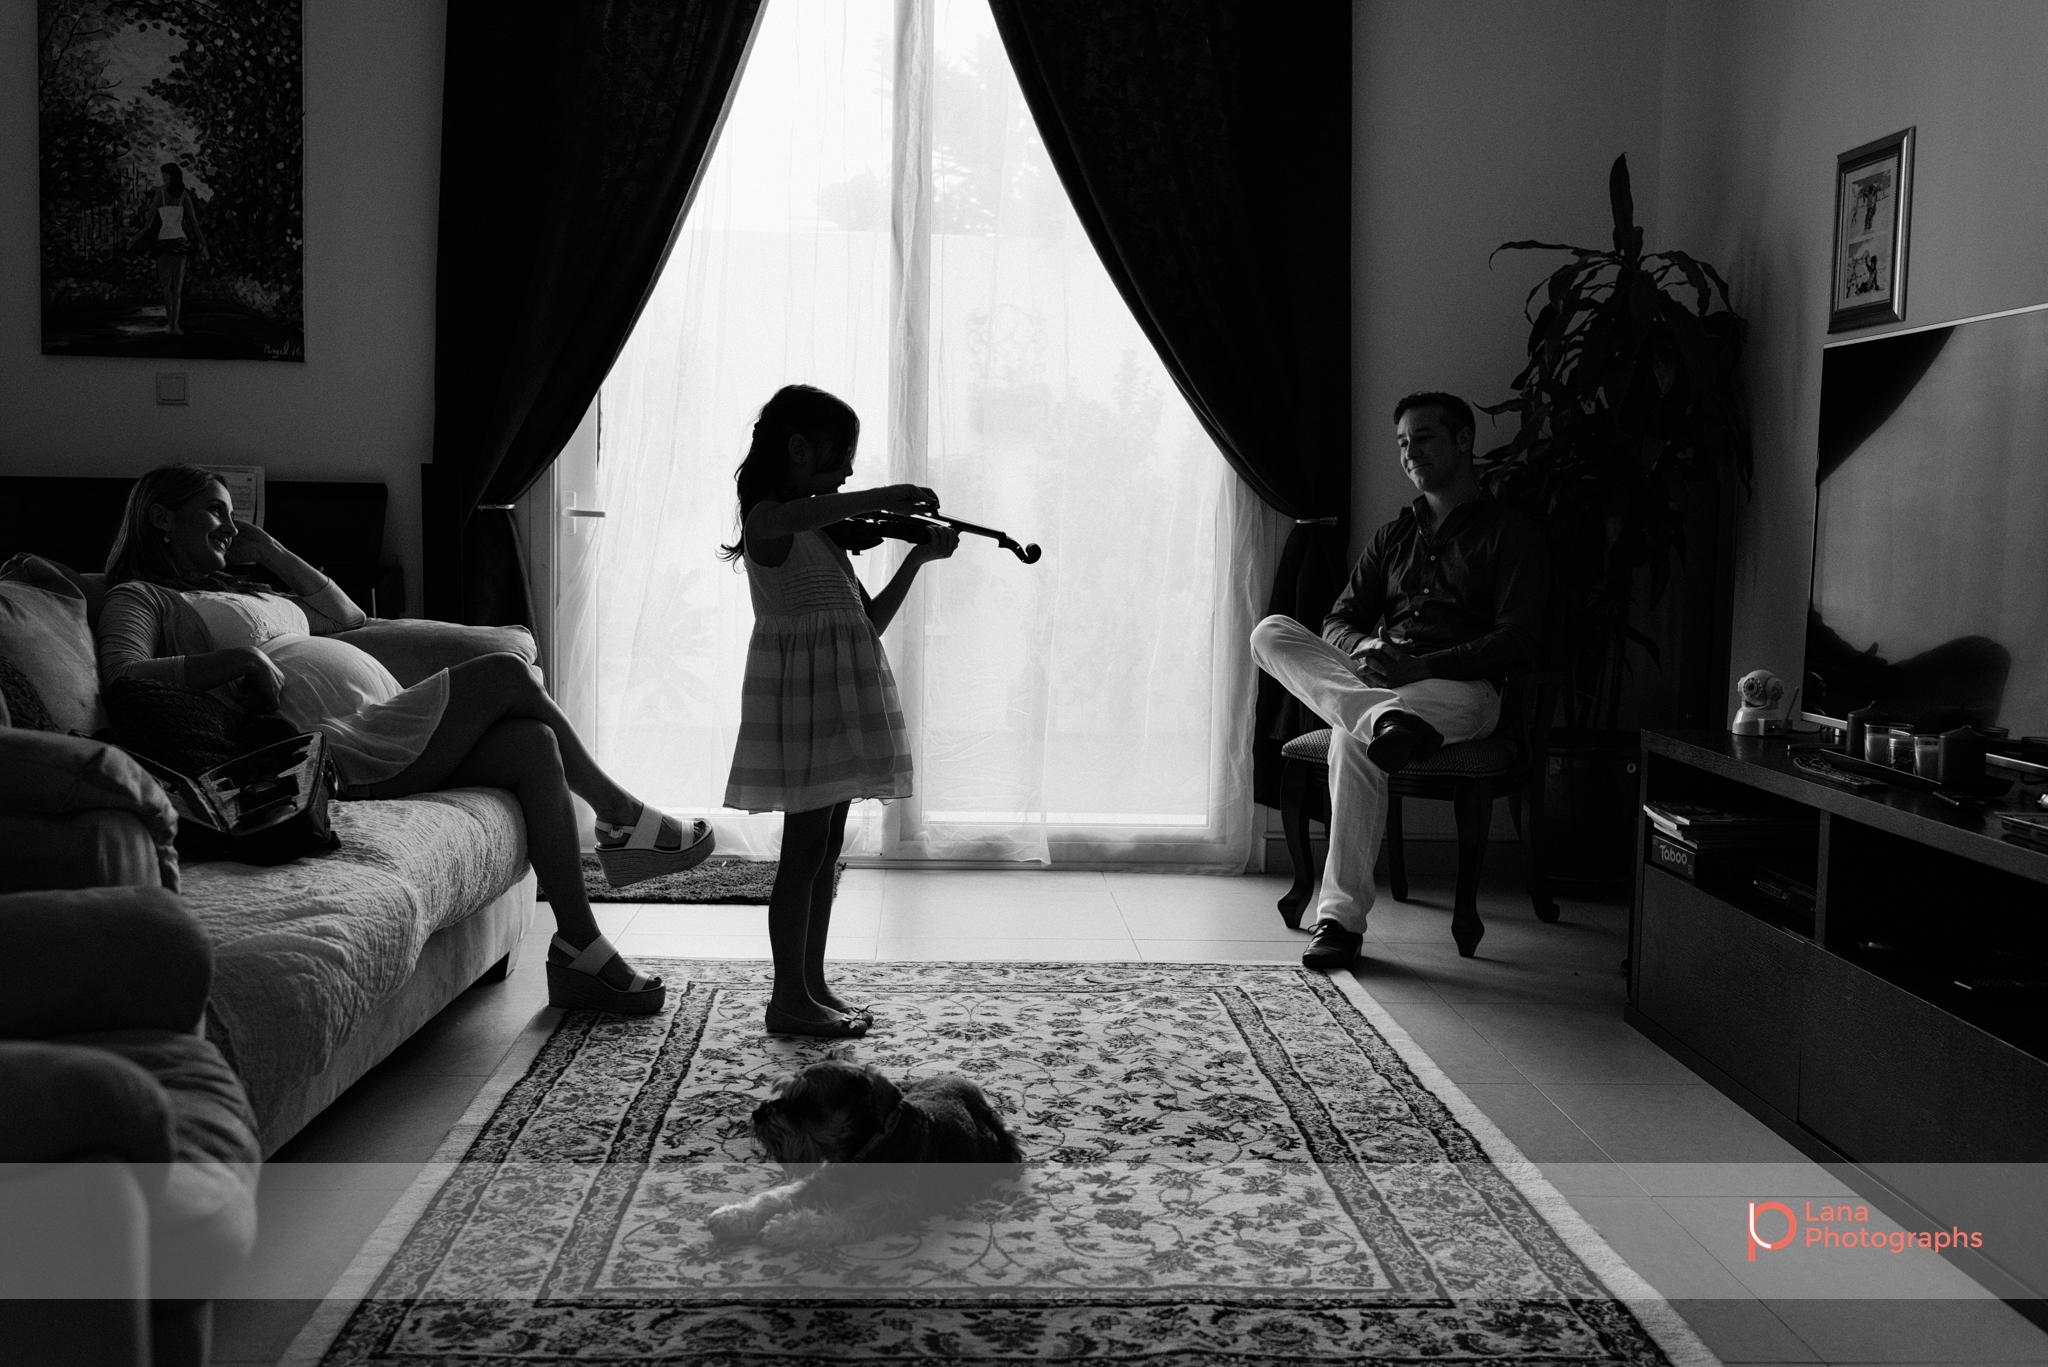 Lana-Photographs-Dubai-Family-Photography-Mayra-01.jpg